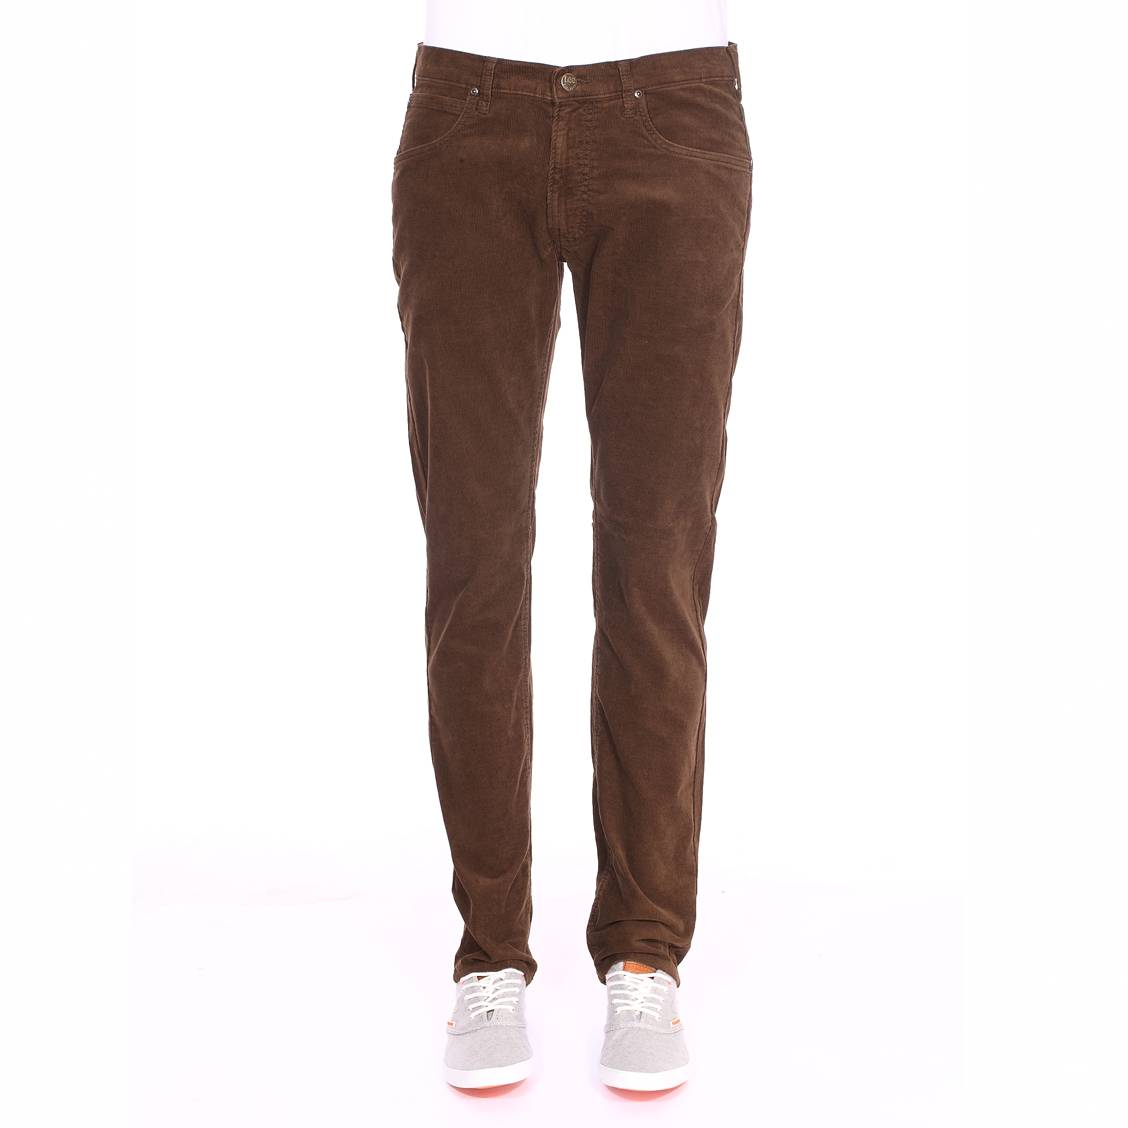 Pantalon droit Lee en velours marron